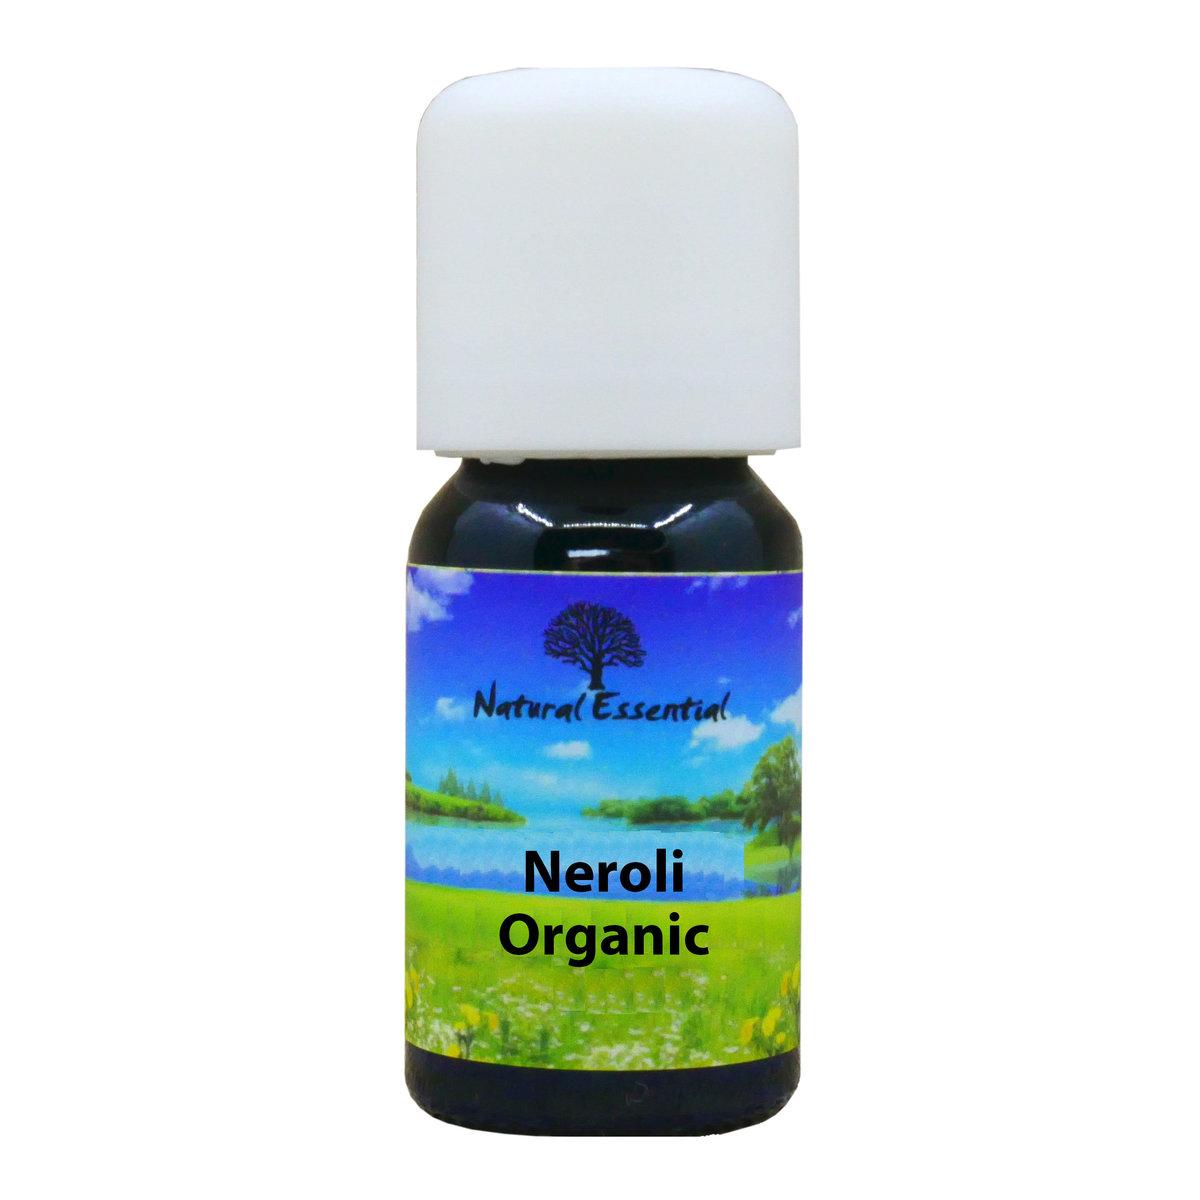 Neroli Essential Oil, Organic (Egypt)